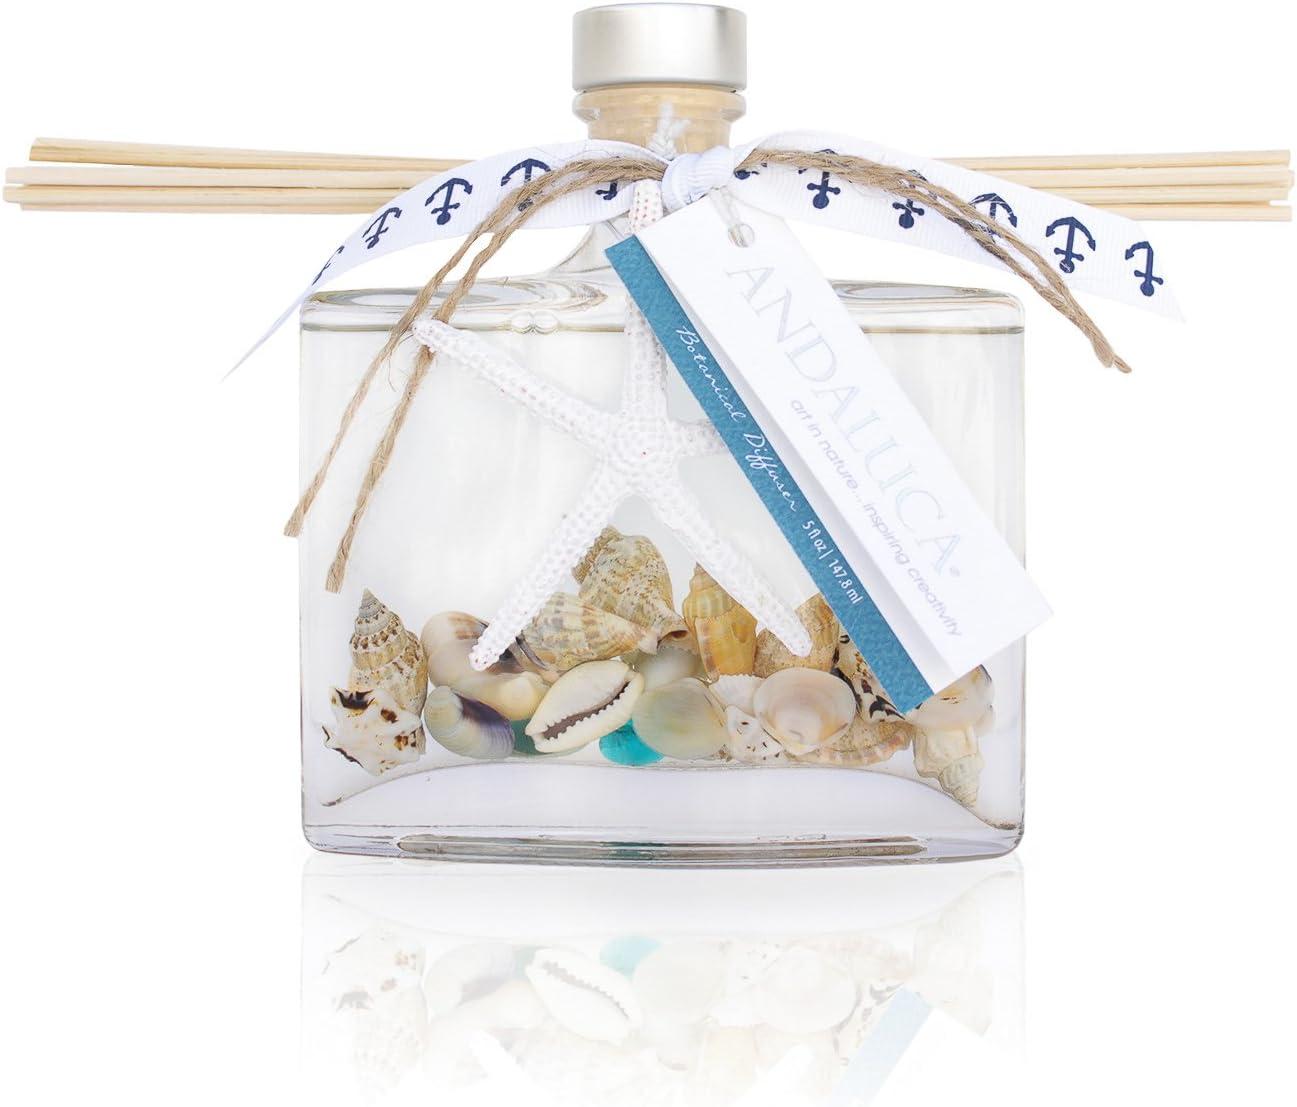 Andaluca Pacific Vanilla Isles Botanical Reed Diffuser | 5.5 fl oz | Aromas of Vanilla, Sandalwood and Sea Salt